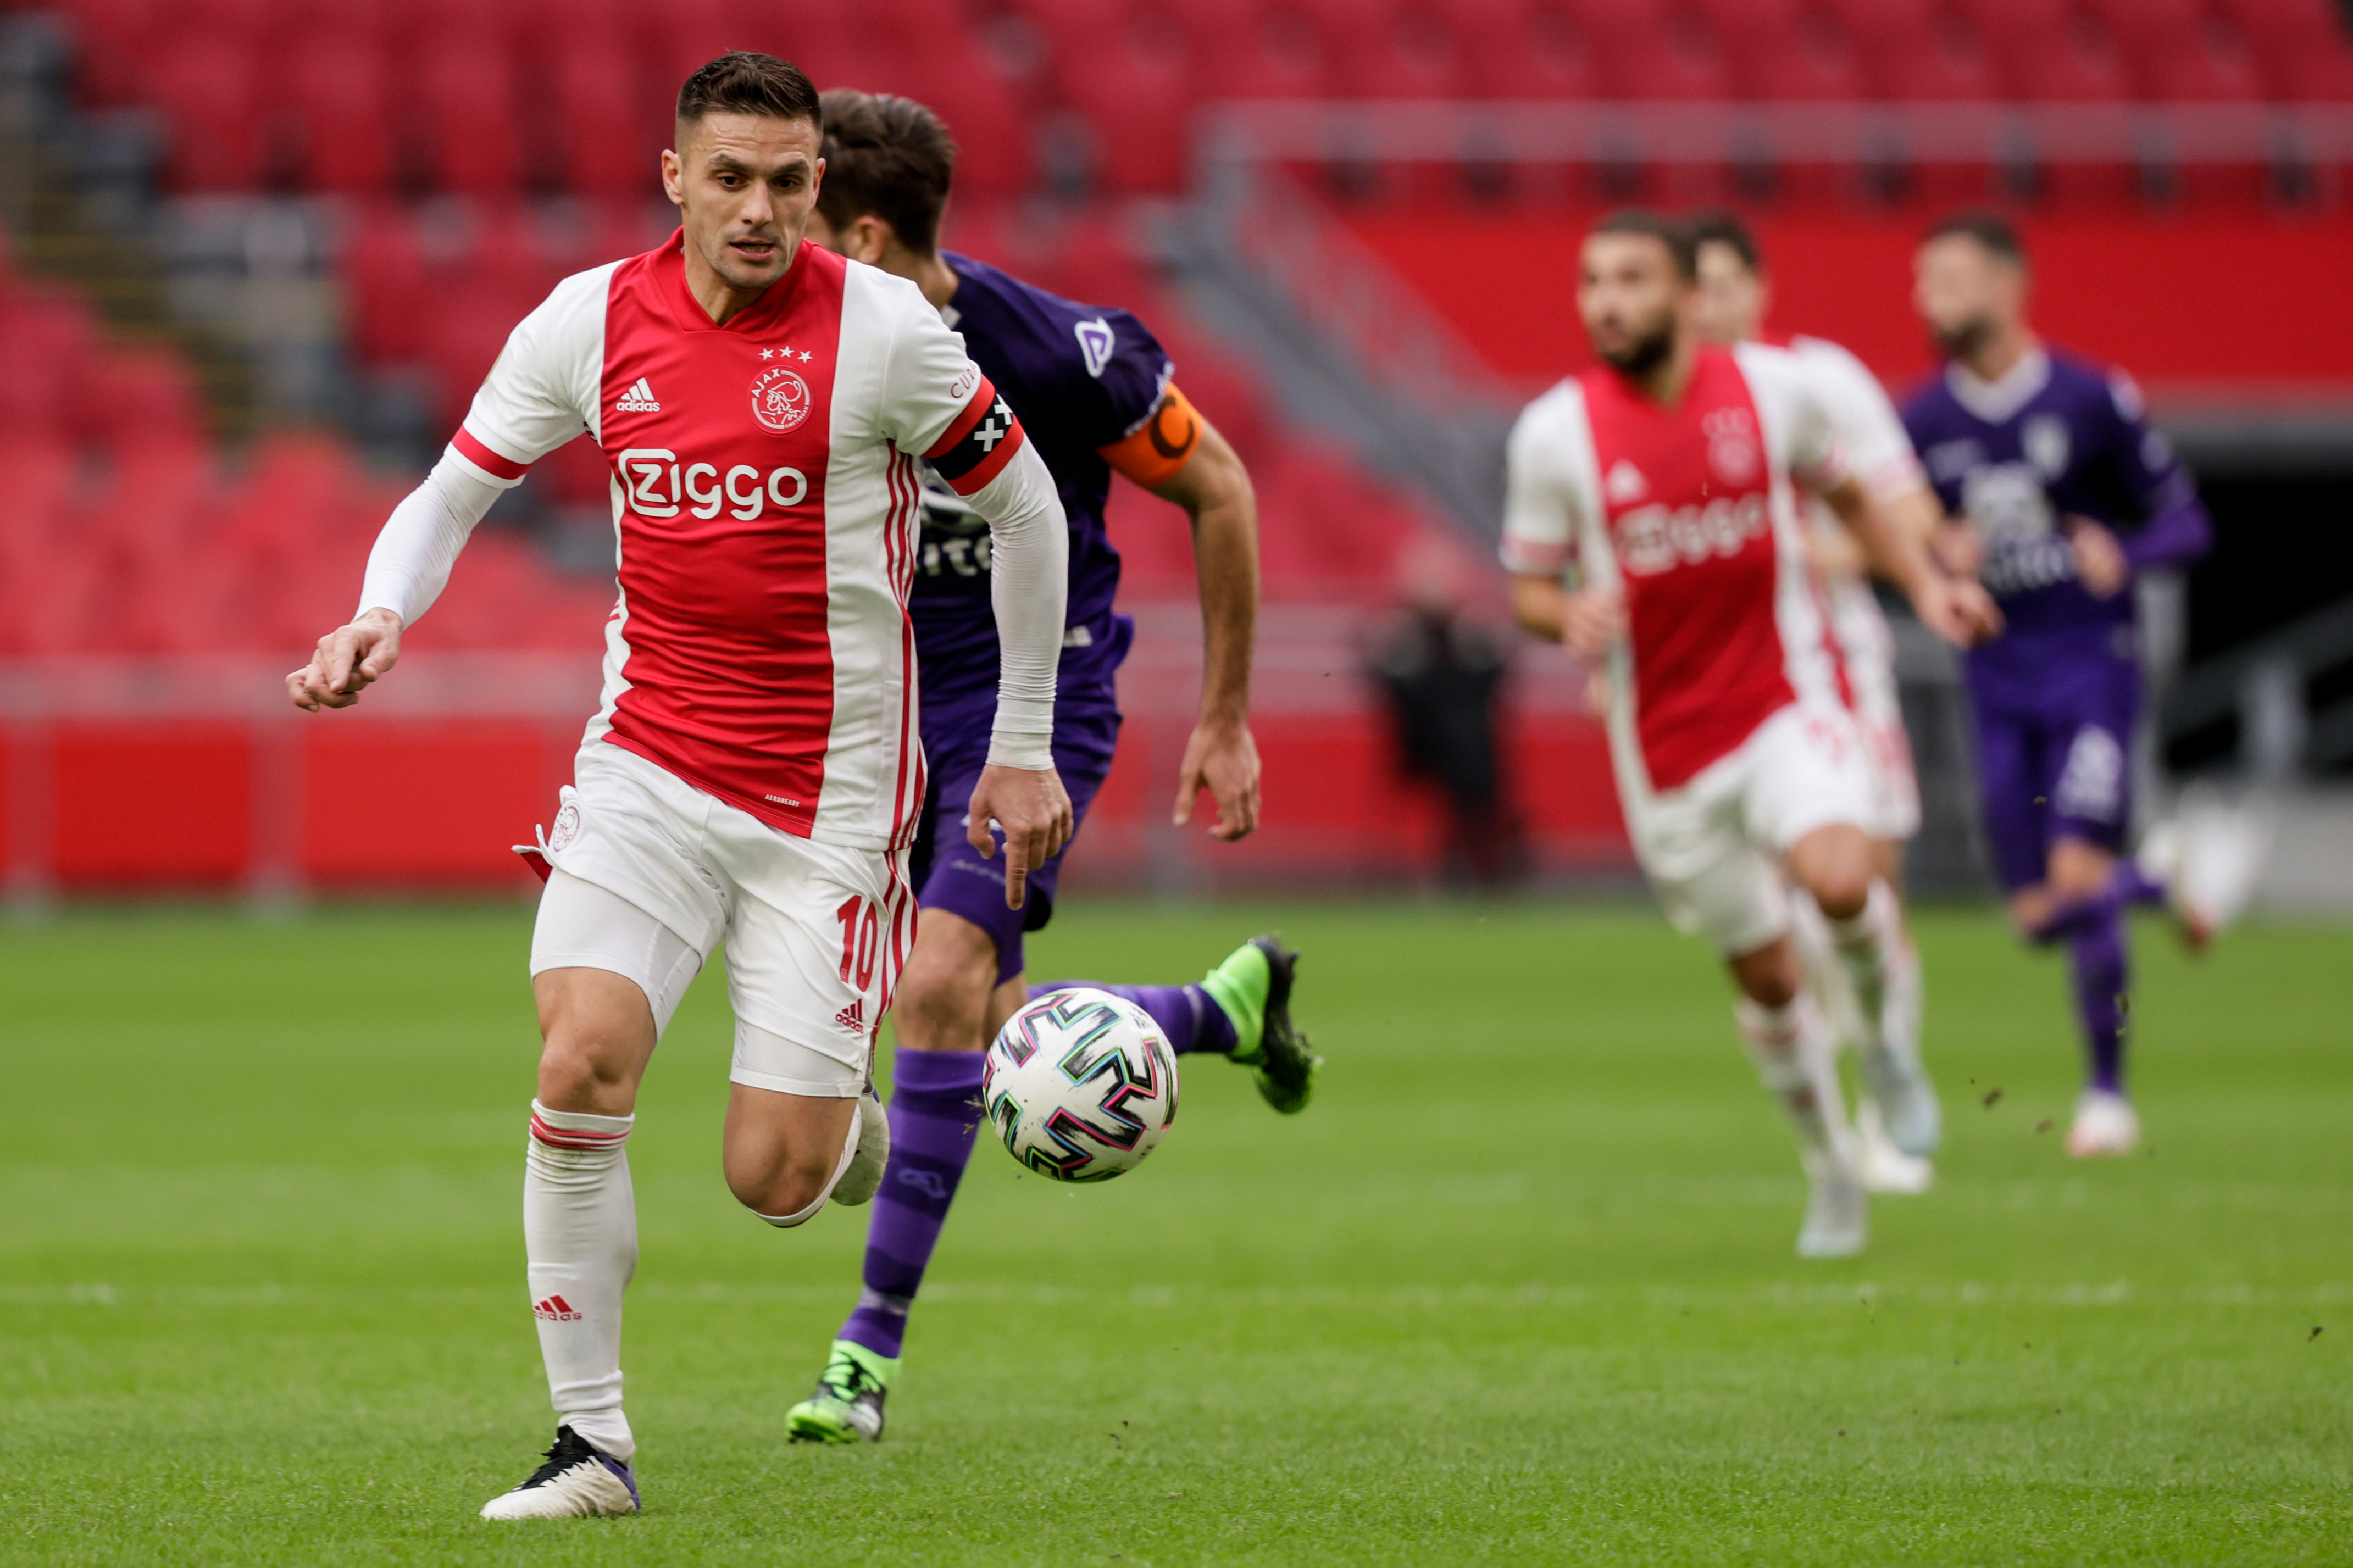 Ajax v Heracles Almelo - Dutch Eredivisie